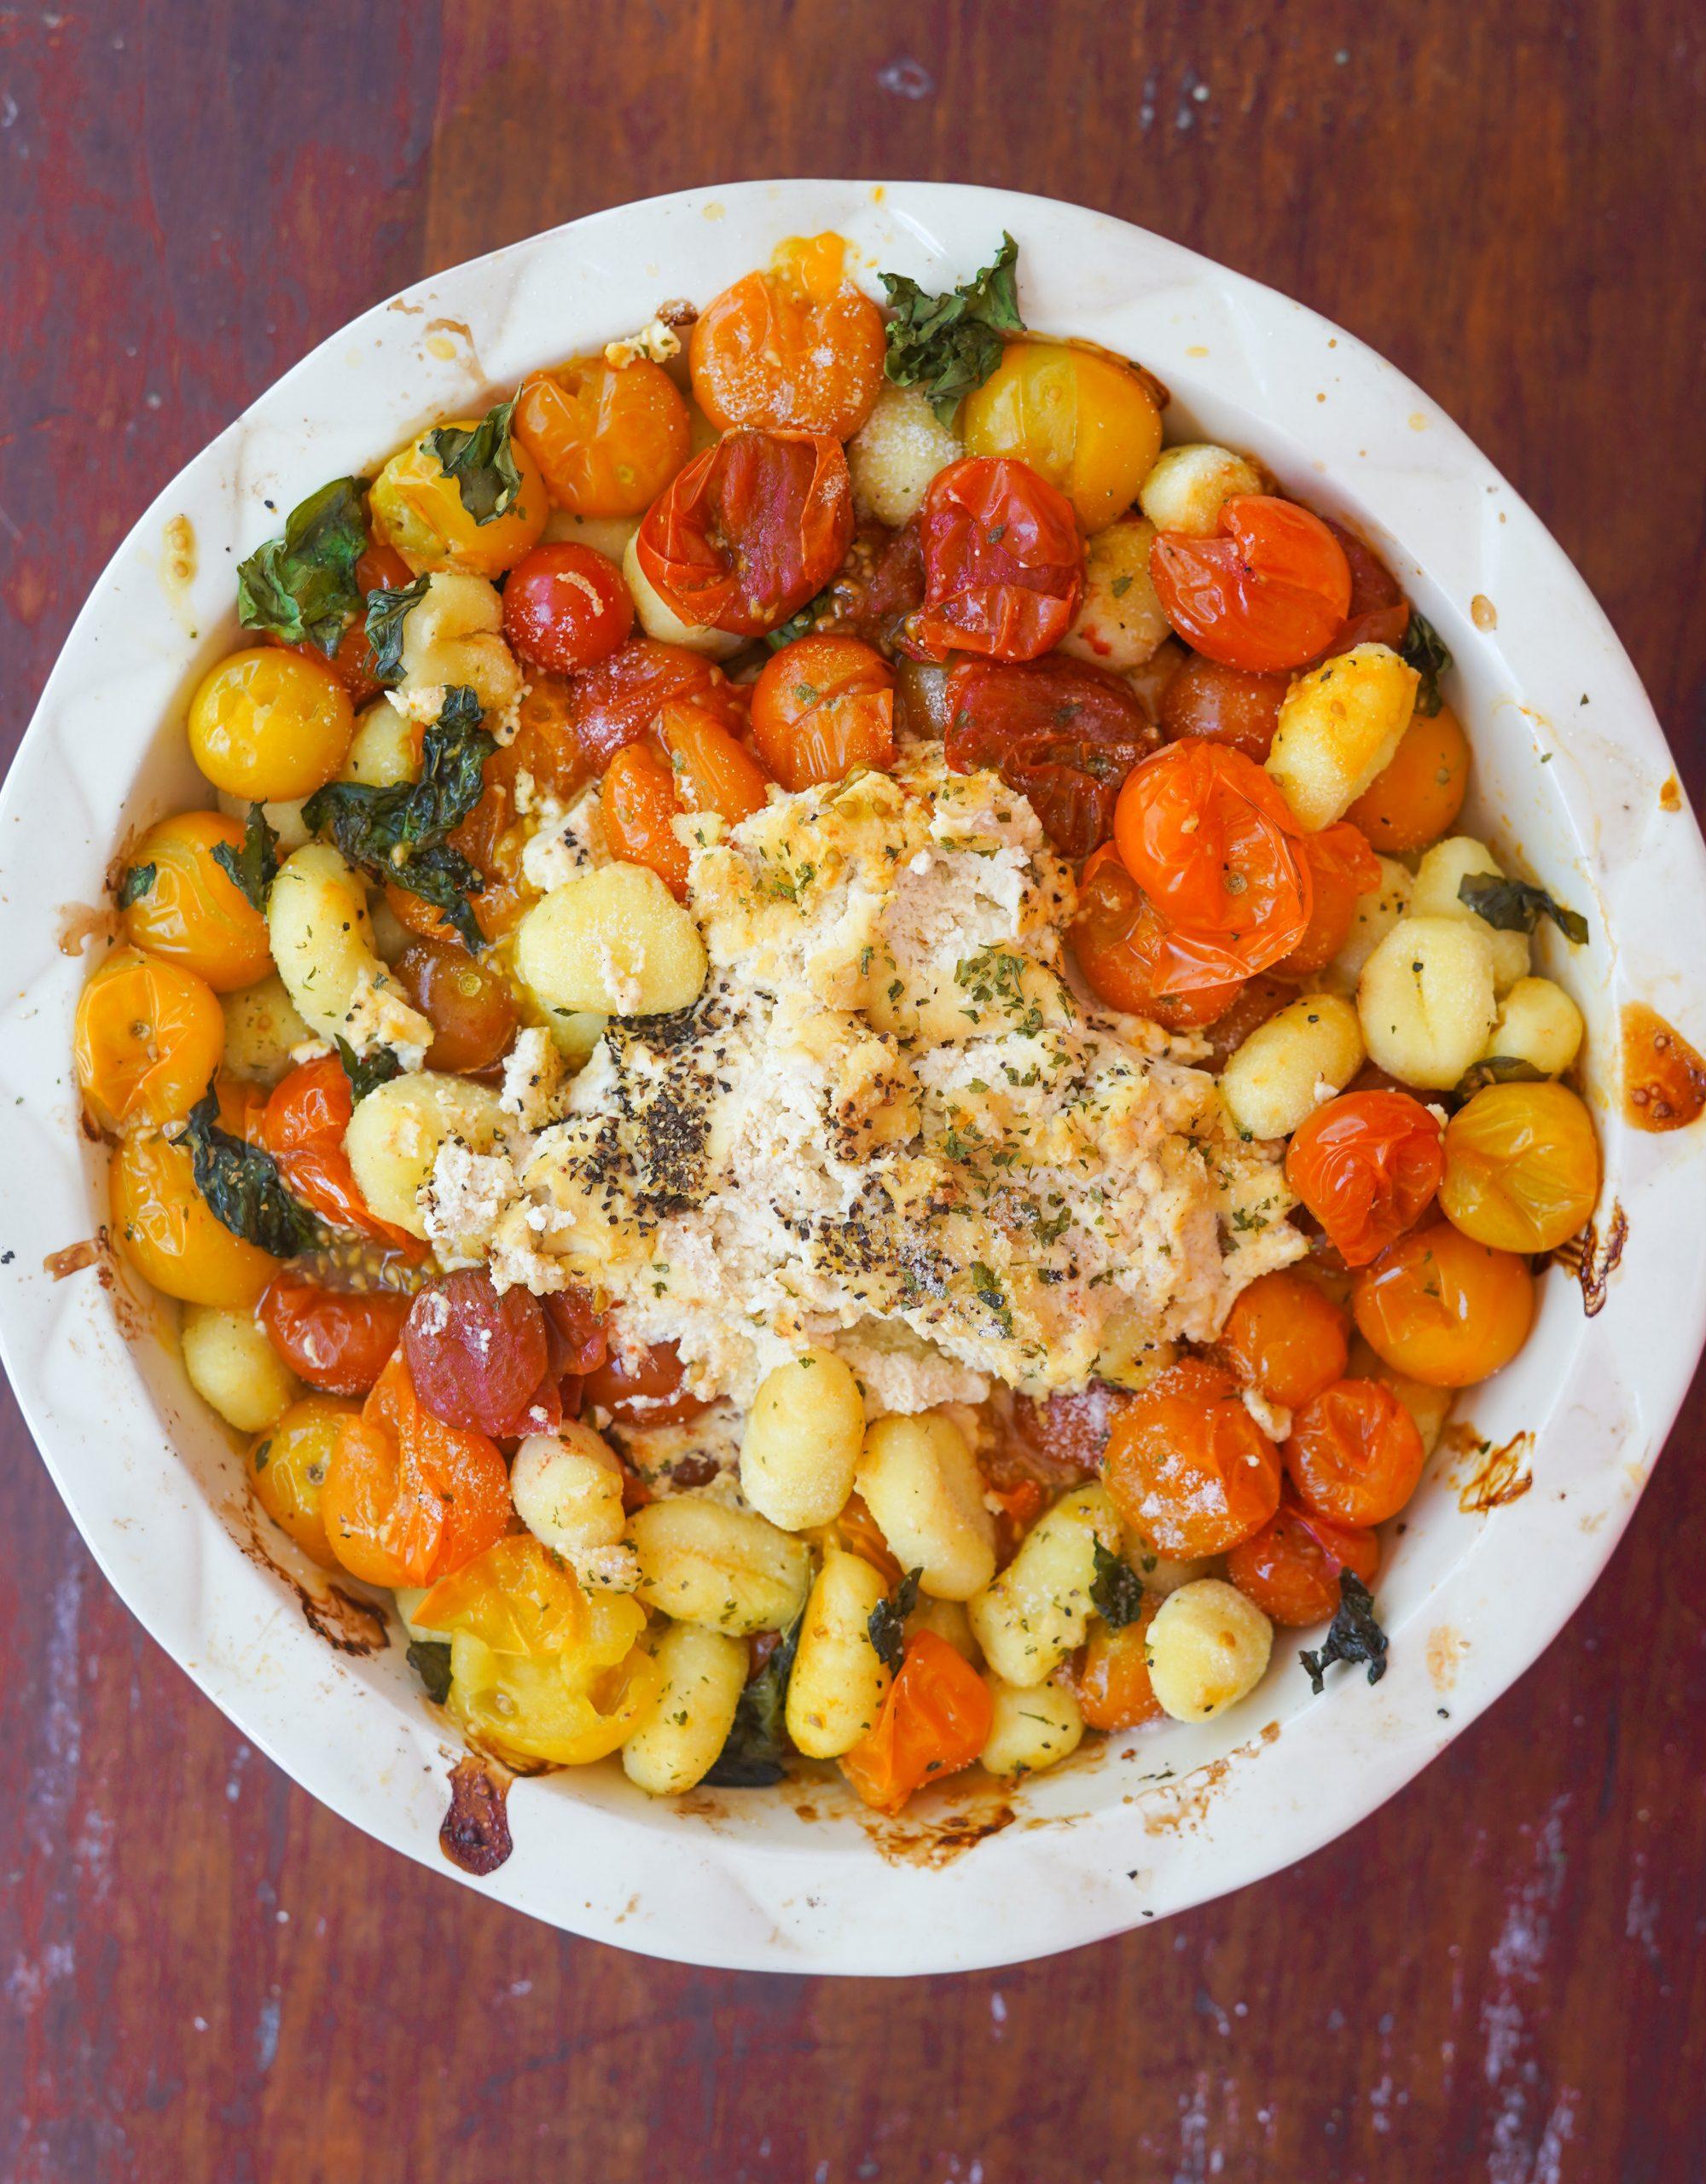 Vegan Baked Feta Gnocchi